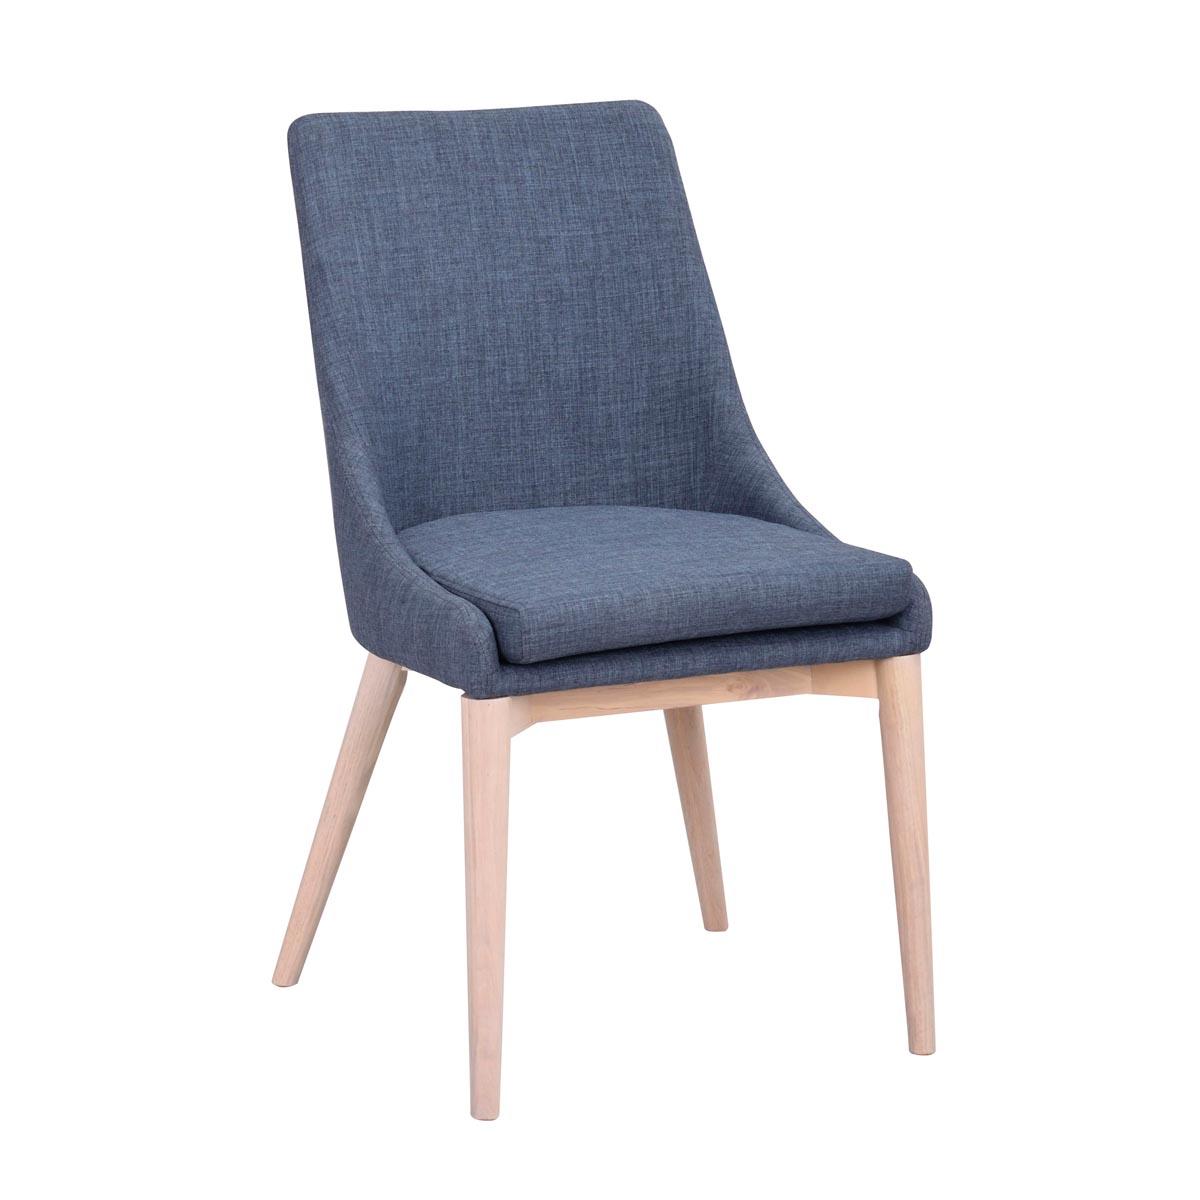 Bea-stol-blått-tyg_wwR-118317_a